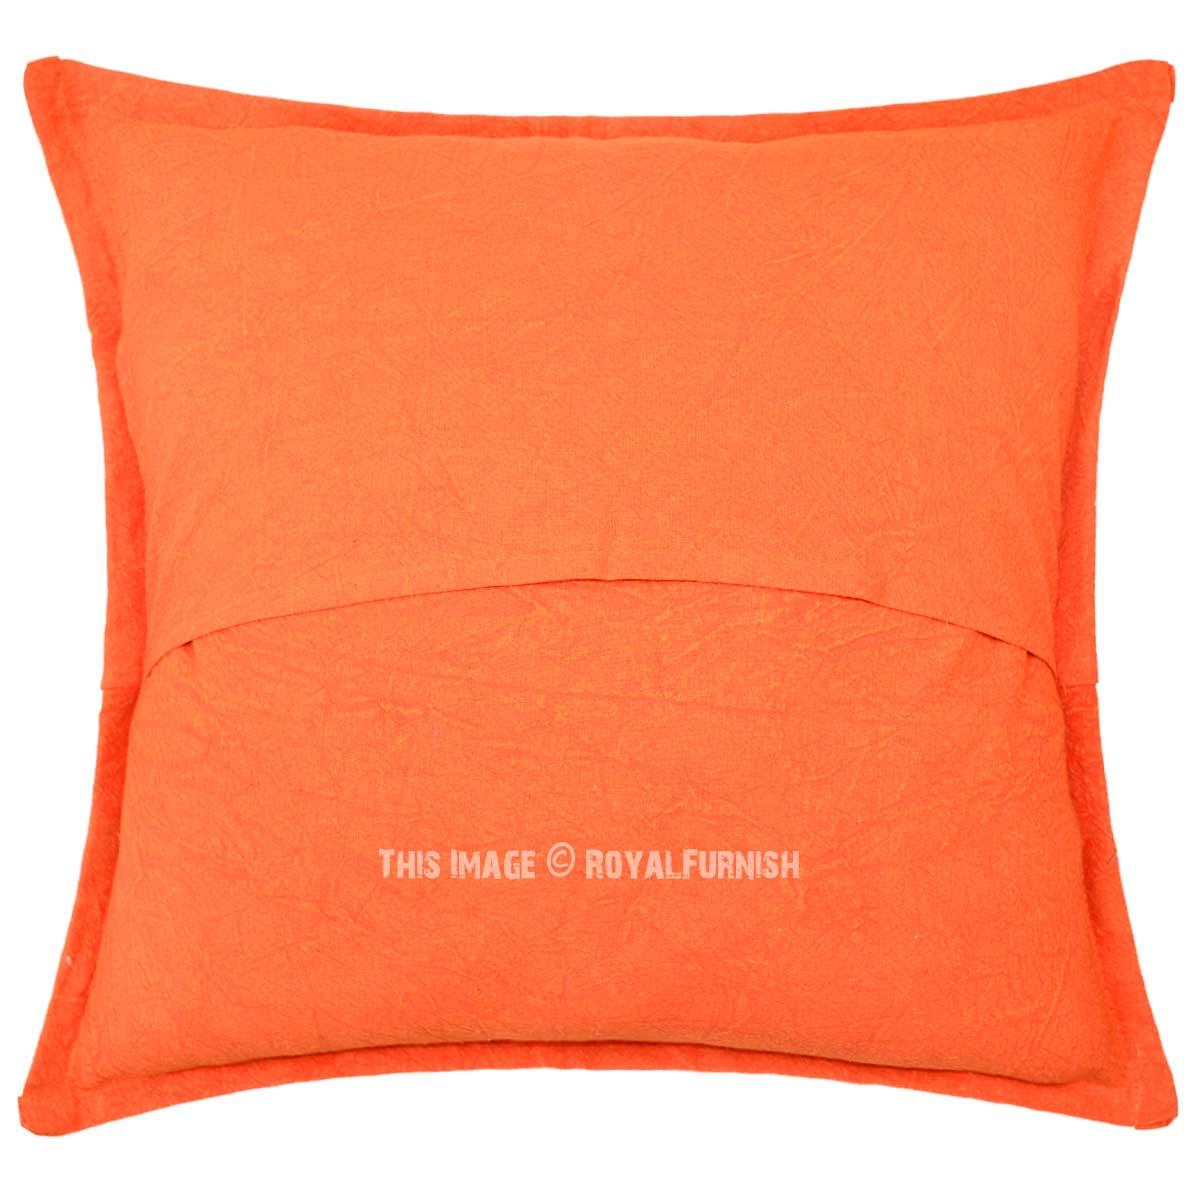 Orange Unique One-Of-A-Kind Decorative Star Mirrored Cotton Pillow Cover 16X16 Inch ...